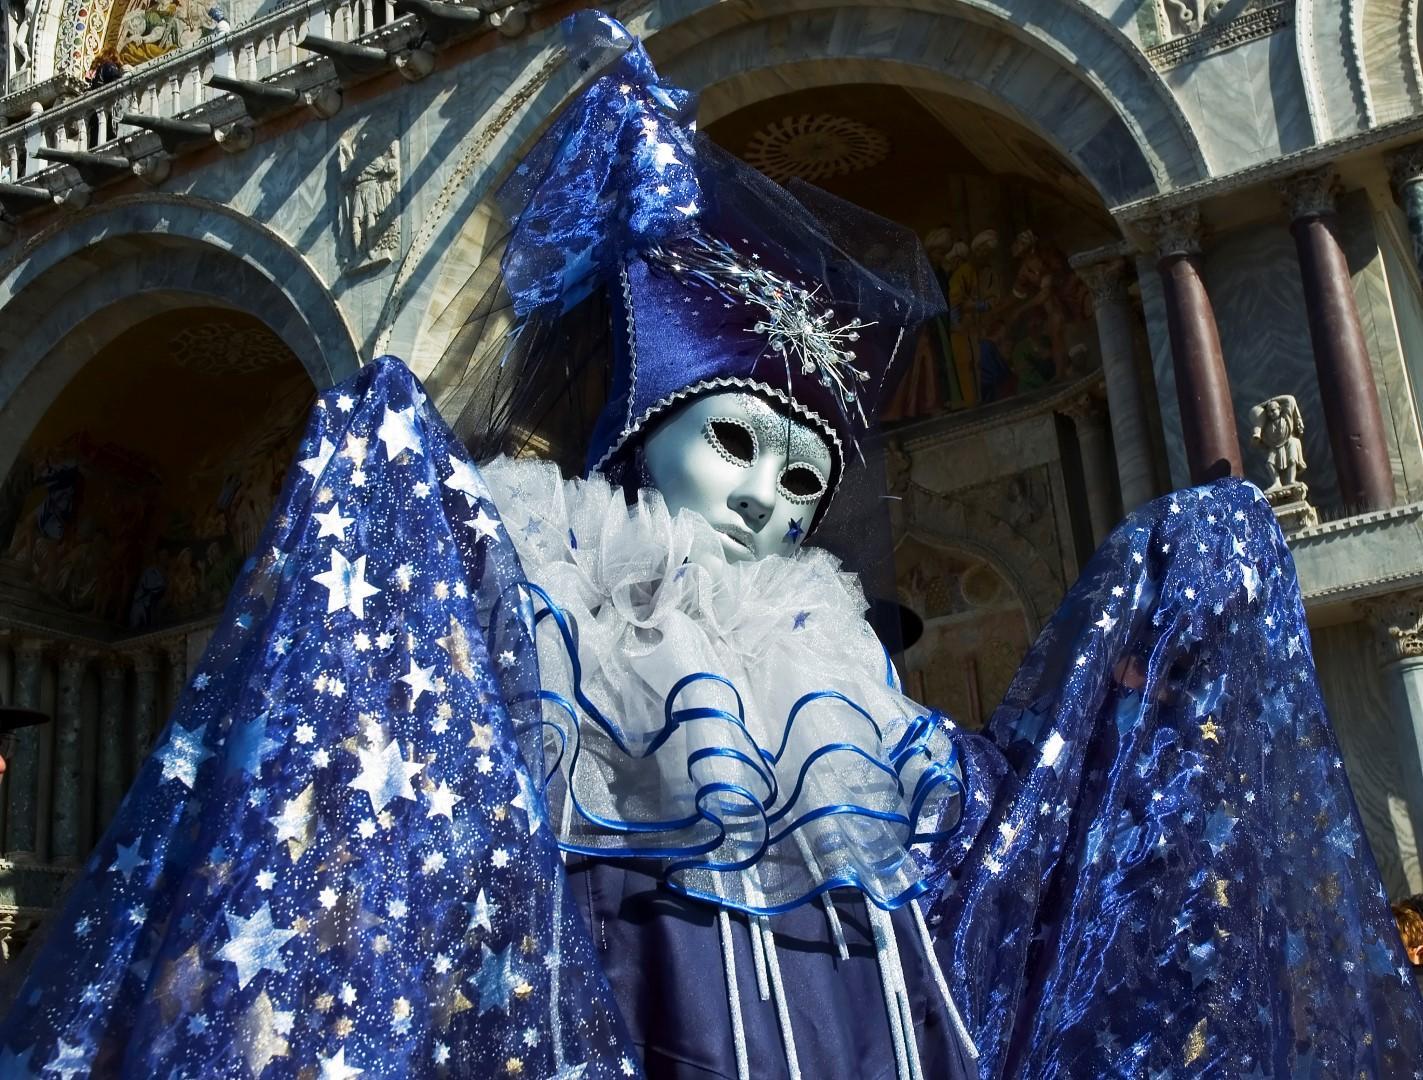 Carnevale di Venezia, Luna protagonista per 20 giorni